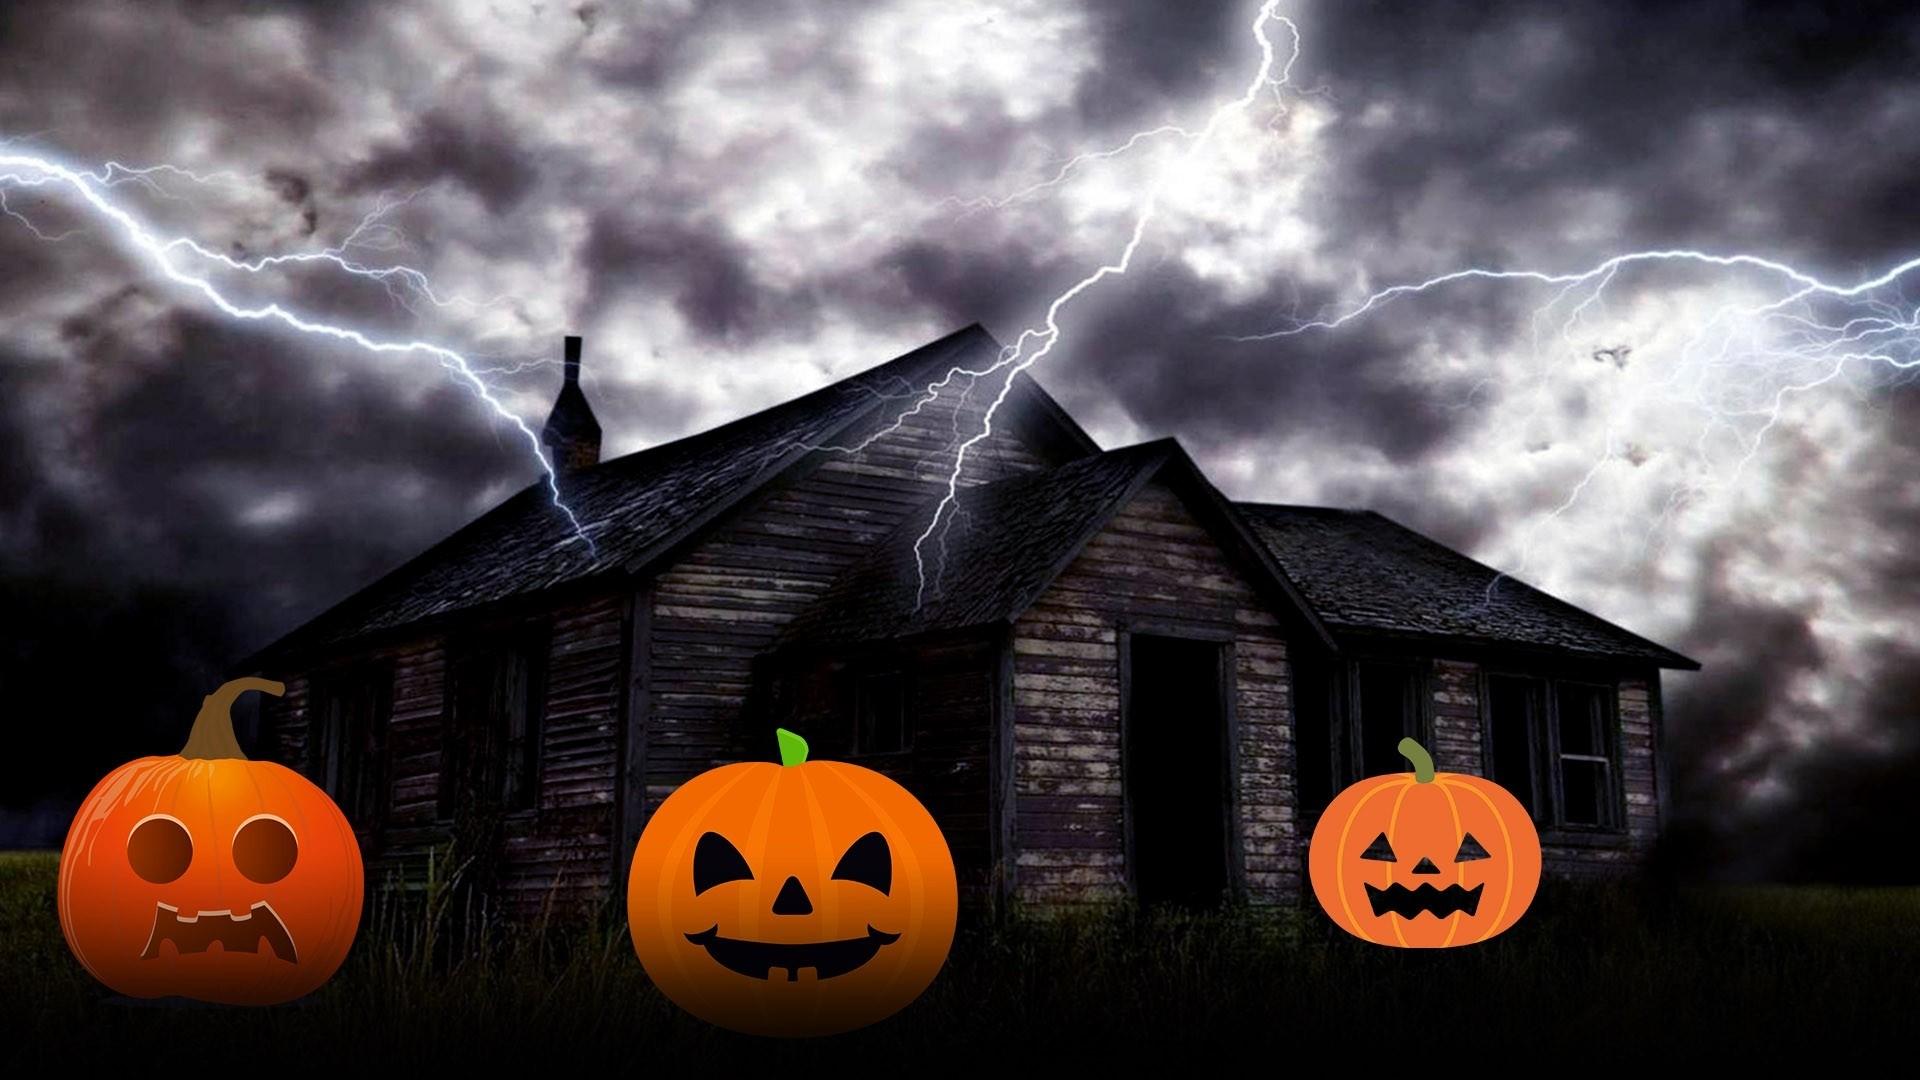 Halloween 2020 Wallpaper theme